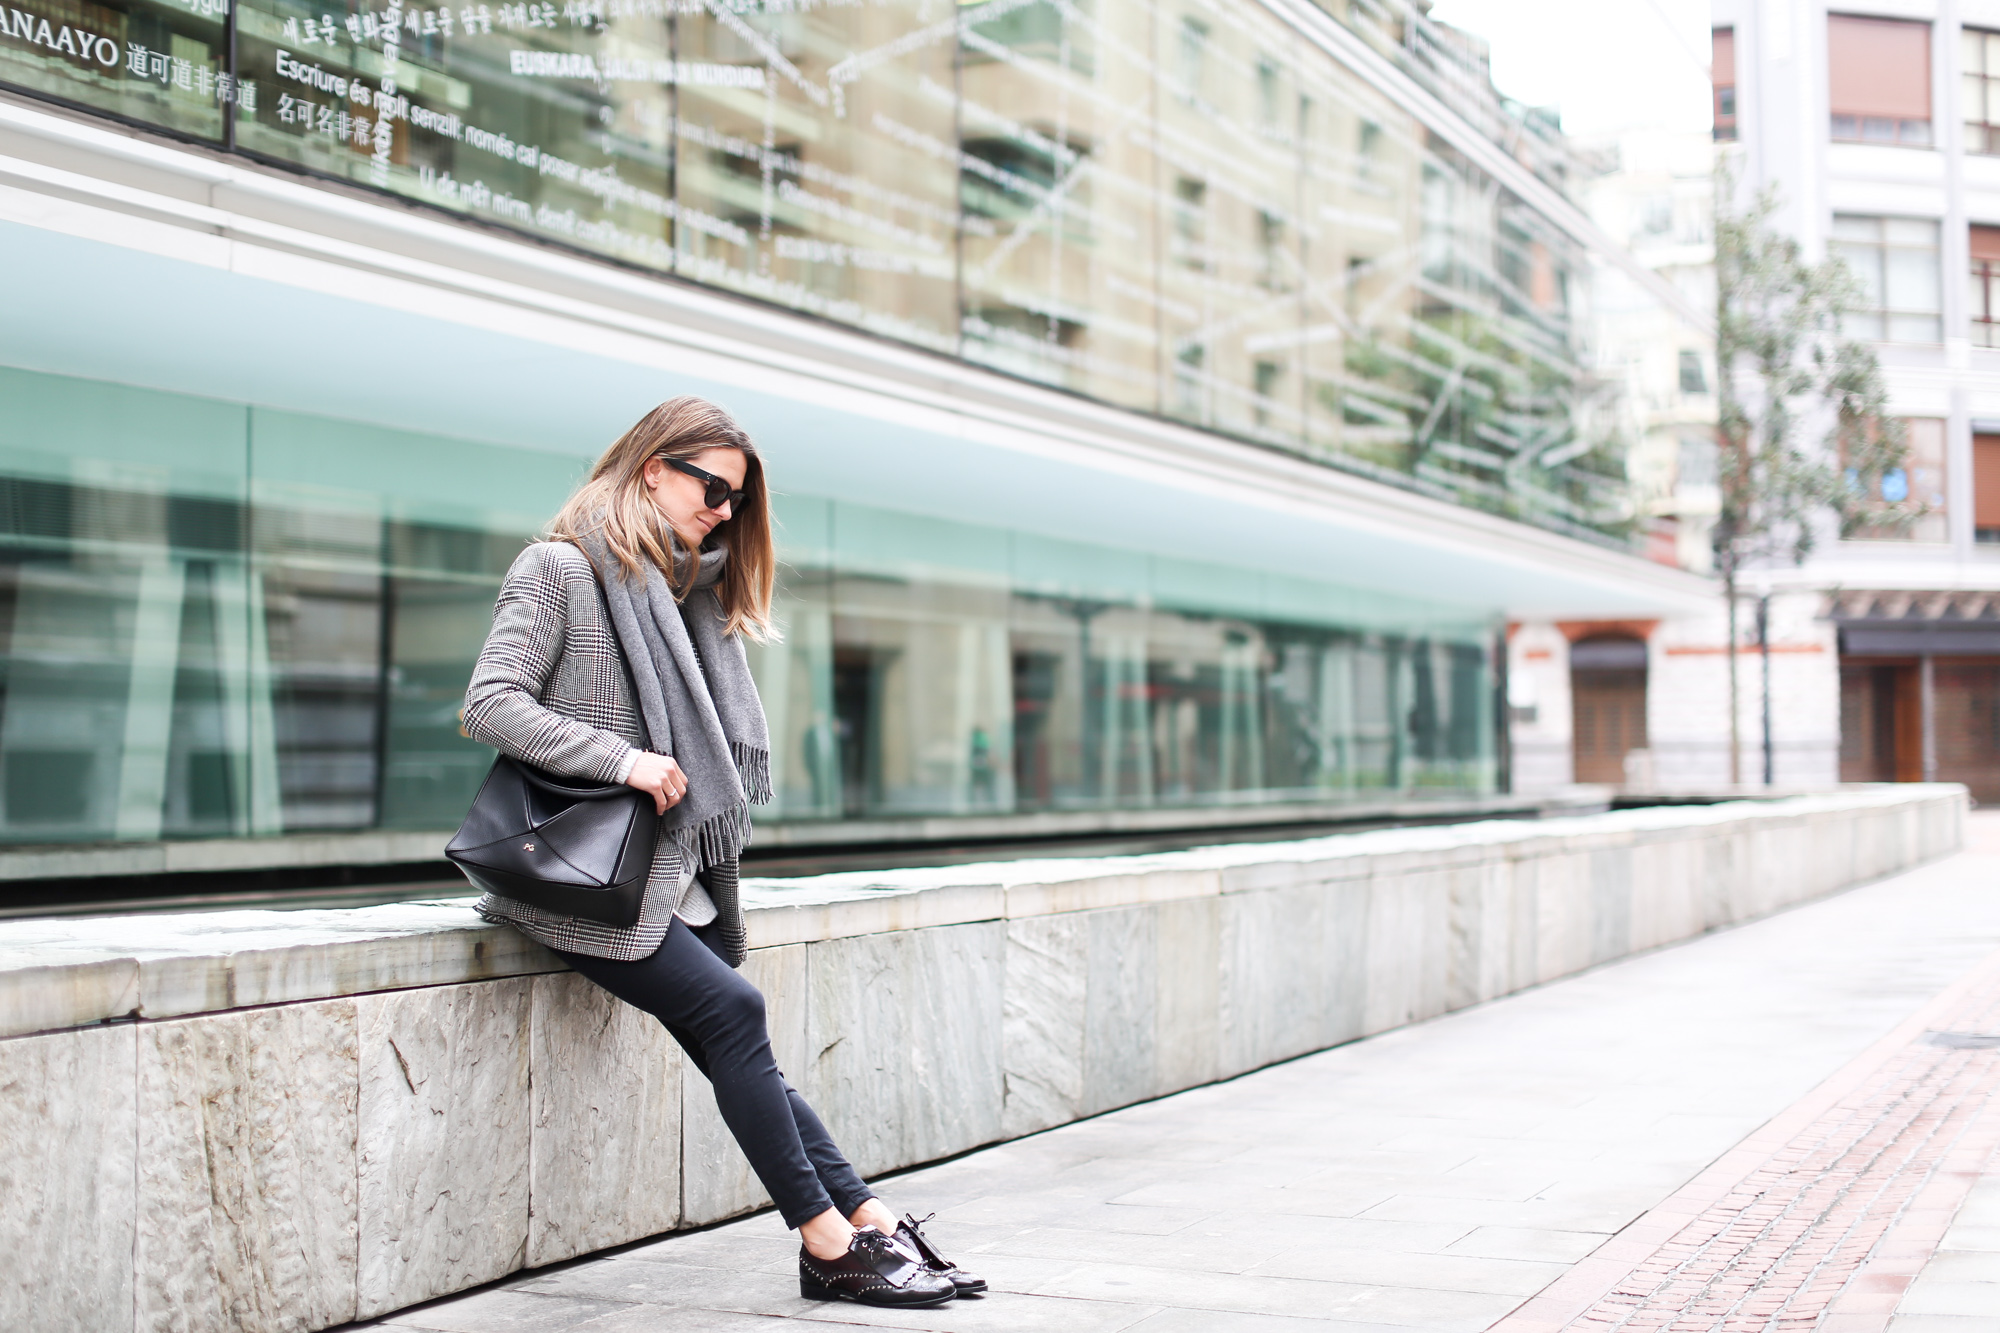 Clochet_streetstyle_fashionblogger_zapatosoxfordtachuelasPertini_bolsotangrampurificaciongarcia-2